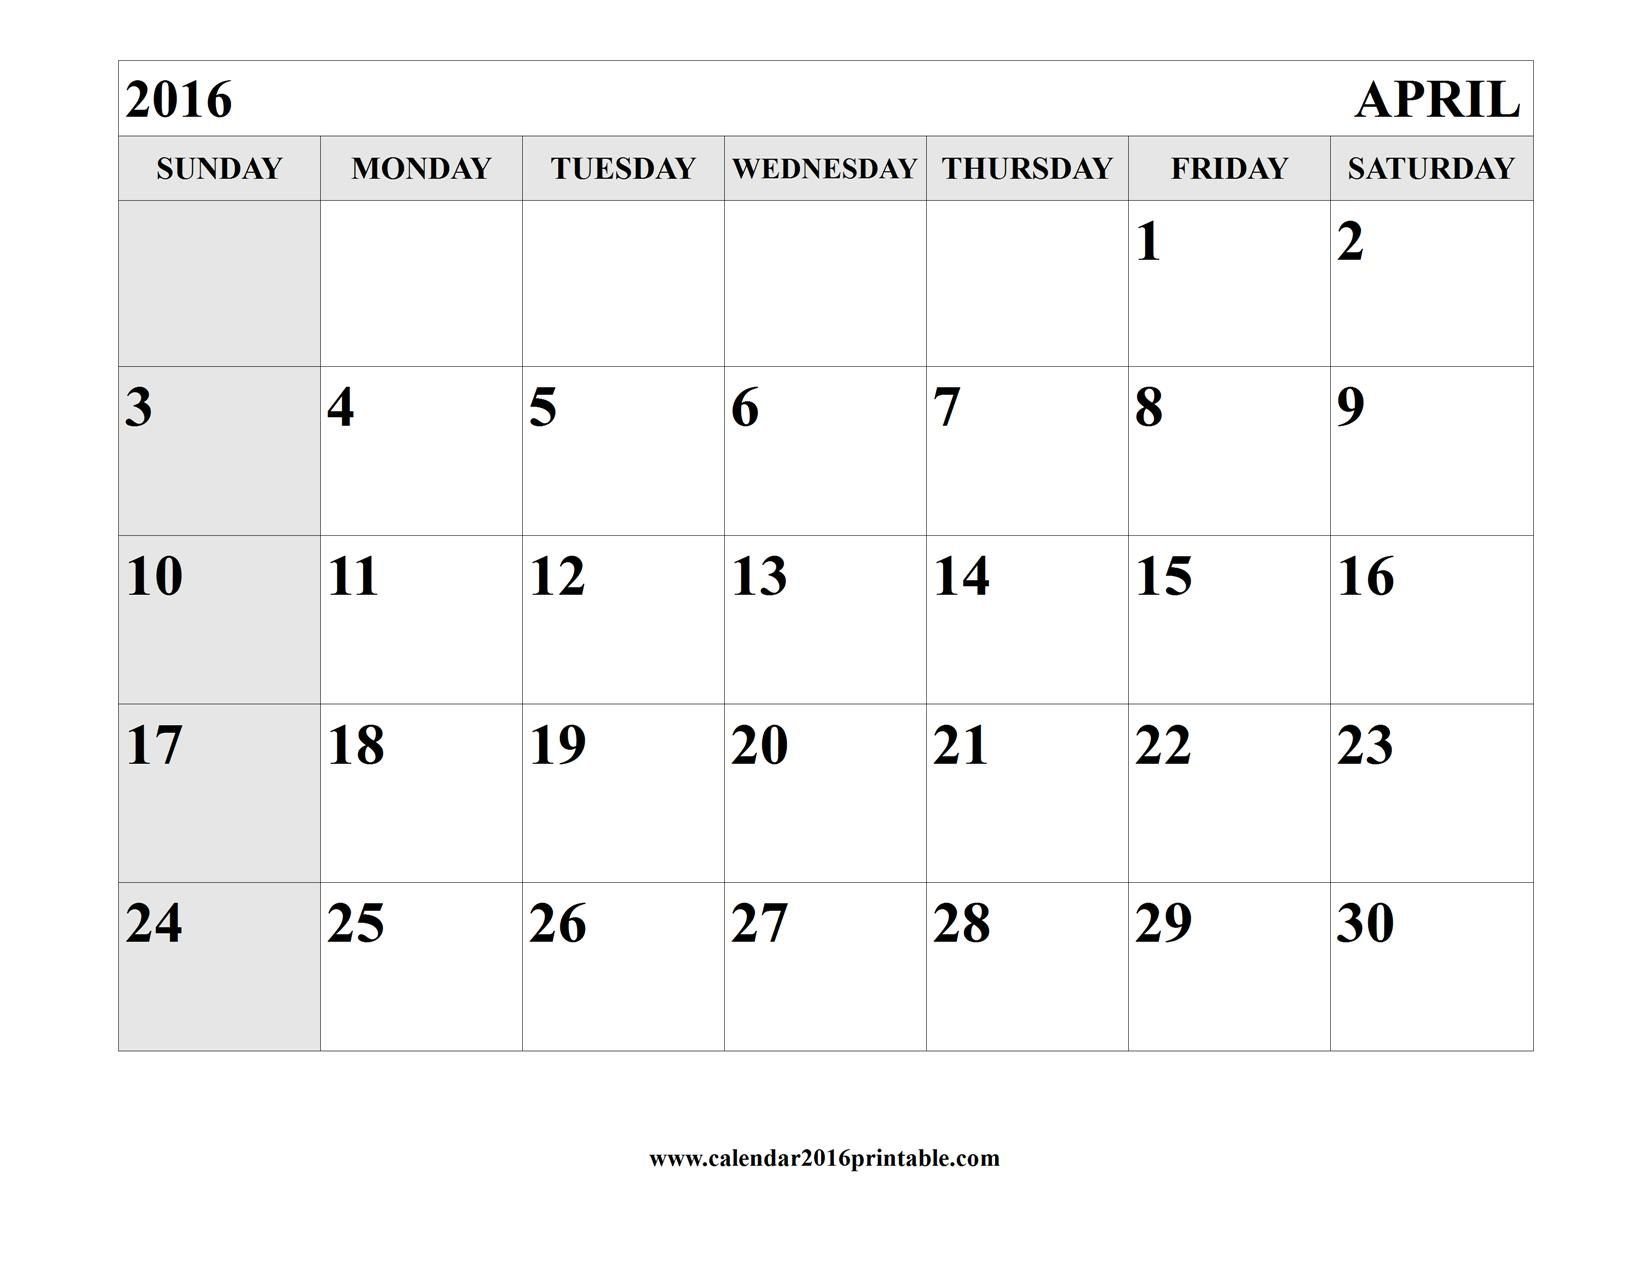 April 2016 Calendar Printable Template | Calendar Template Calender That Yopu Can Eedit